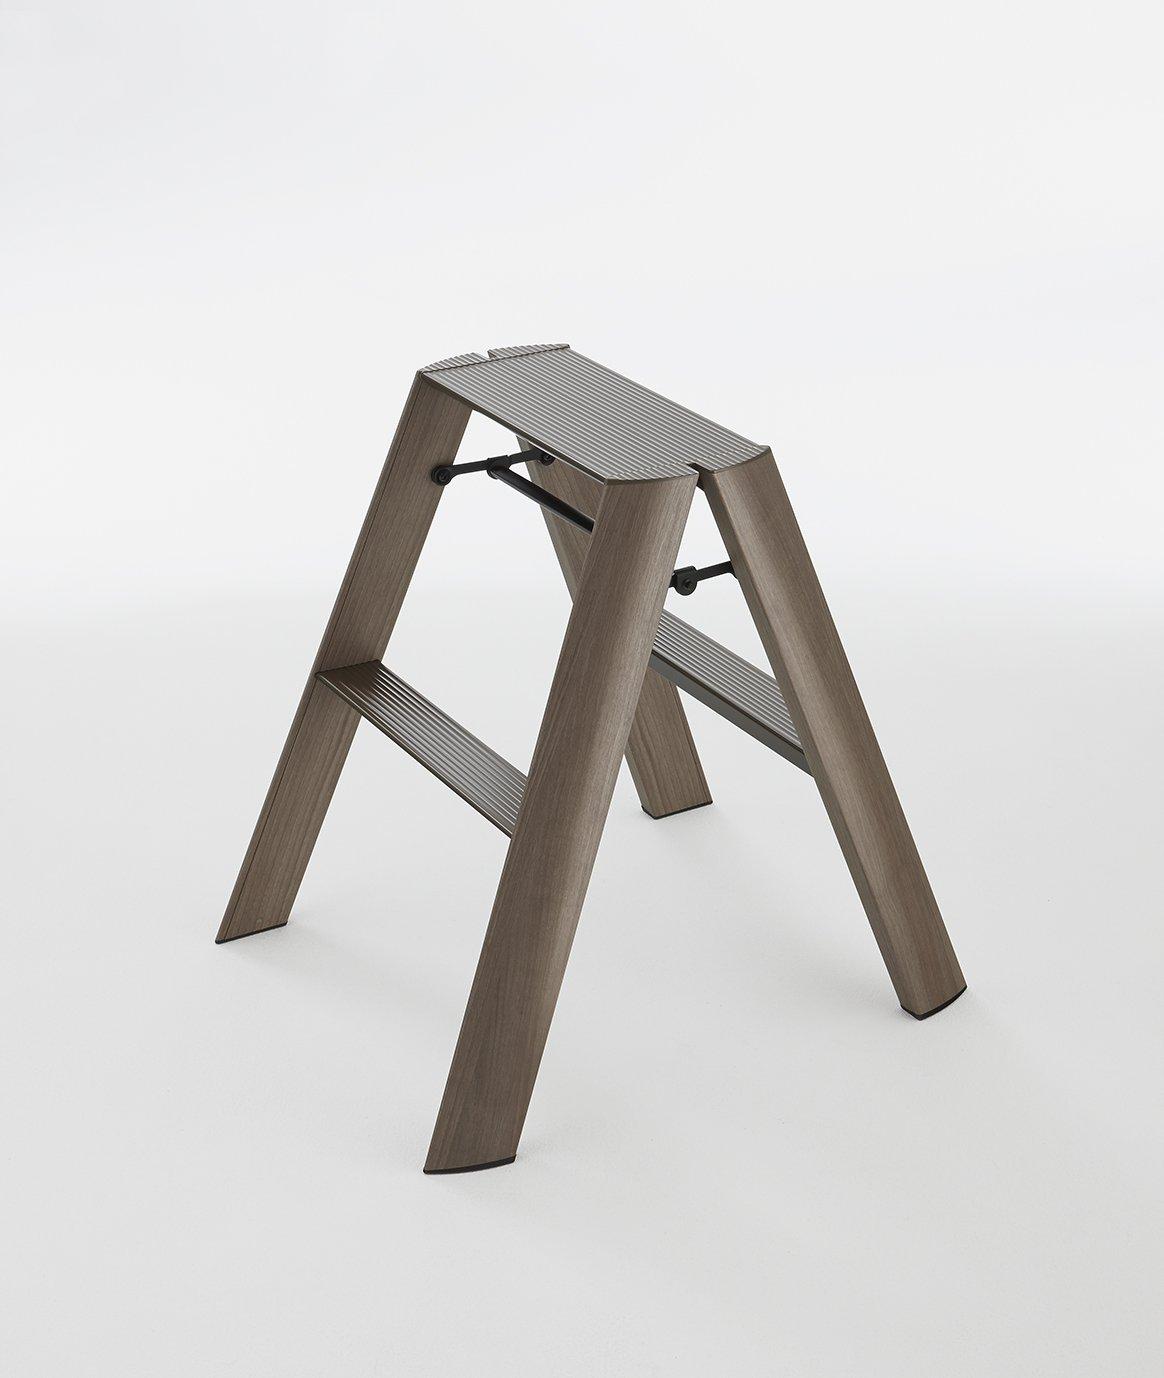 Lucano step stool Slim Design 2 Step Wood Dark Folding Lightweight Aluminum Ladder (Wood Dark)